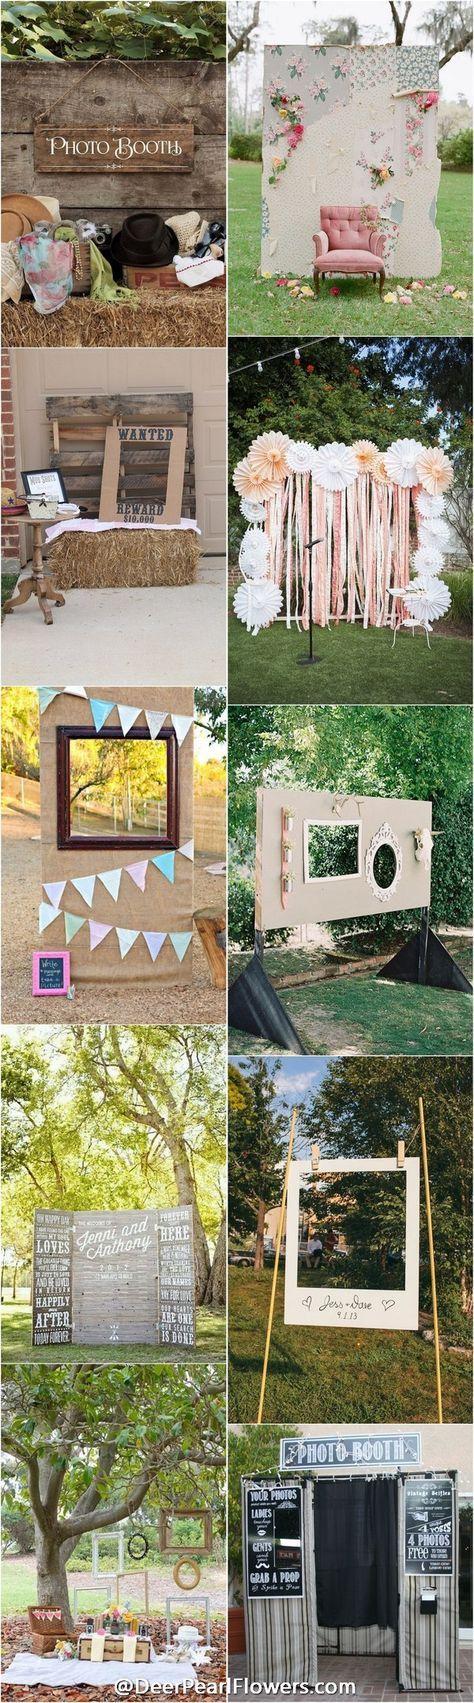 Wedding photo booth backdrop ideas - rustic country wedding ideas / http://www.deerpearlflowers.com/brilliant-wedding-photo-booth-ideas/